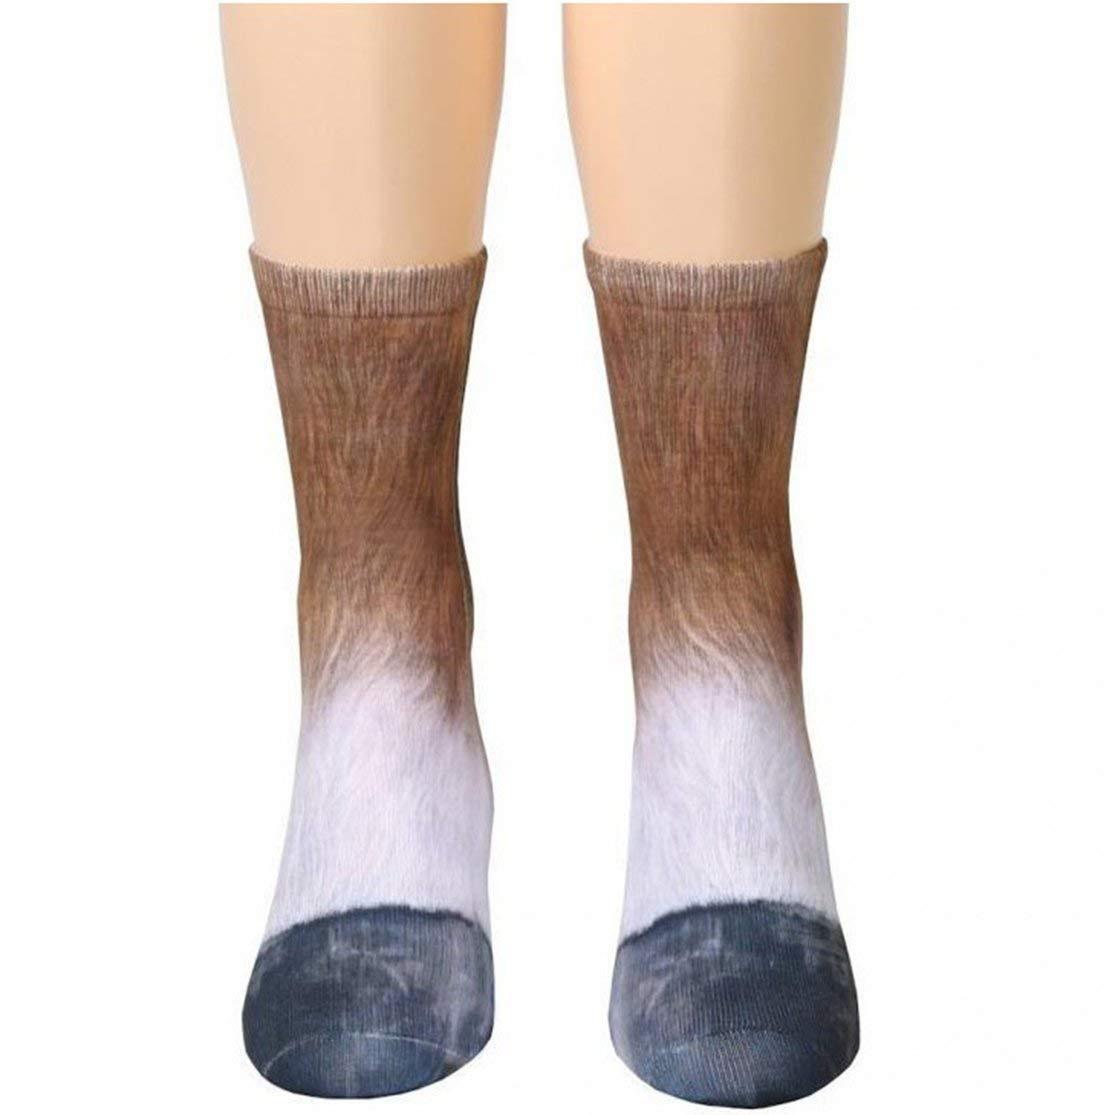 LouiseEvel215 3D Print Animal Foot Hoof Socks Adult Claw Digital Simulation Socks Spot Wholesale Digital Printing Sports Socks